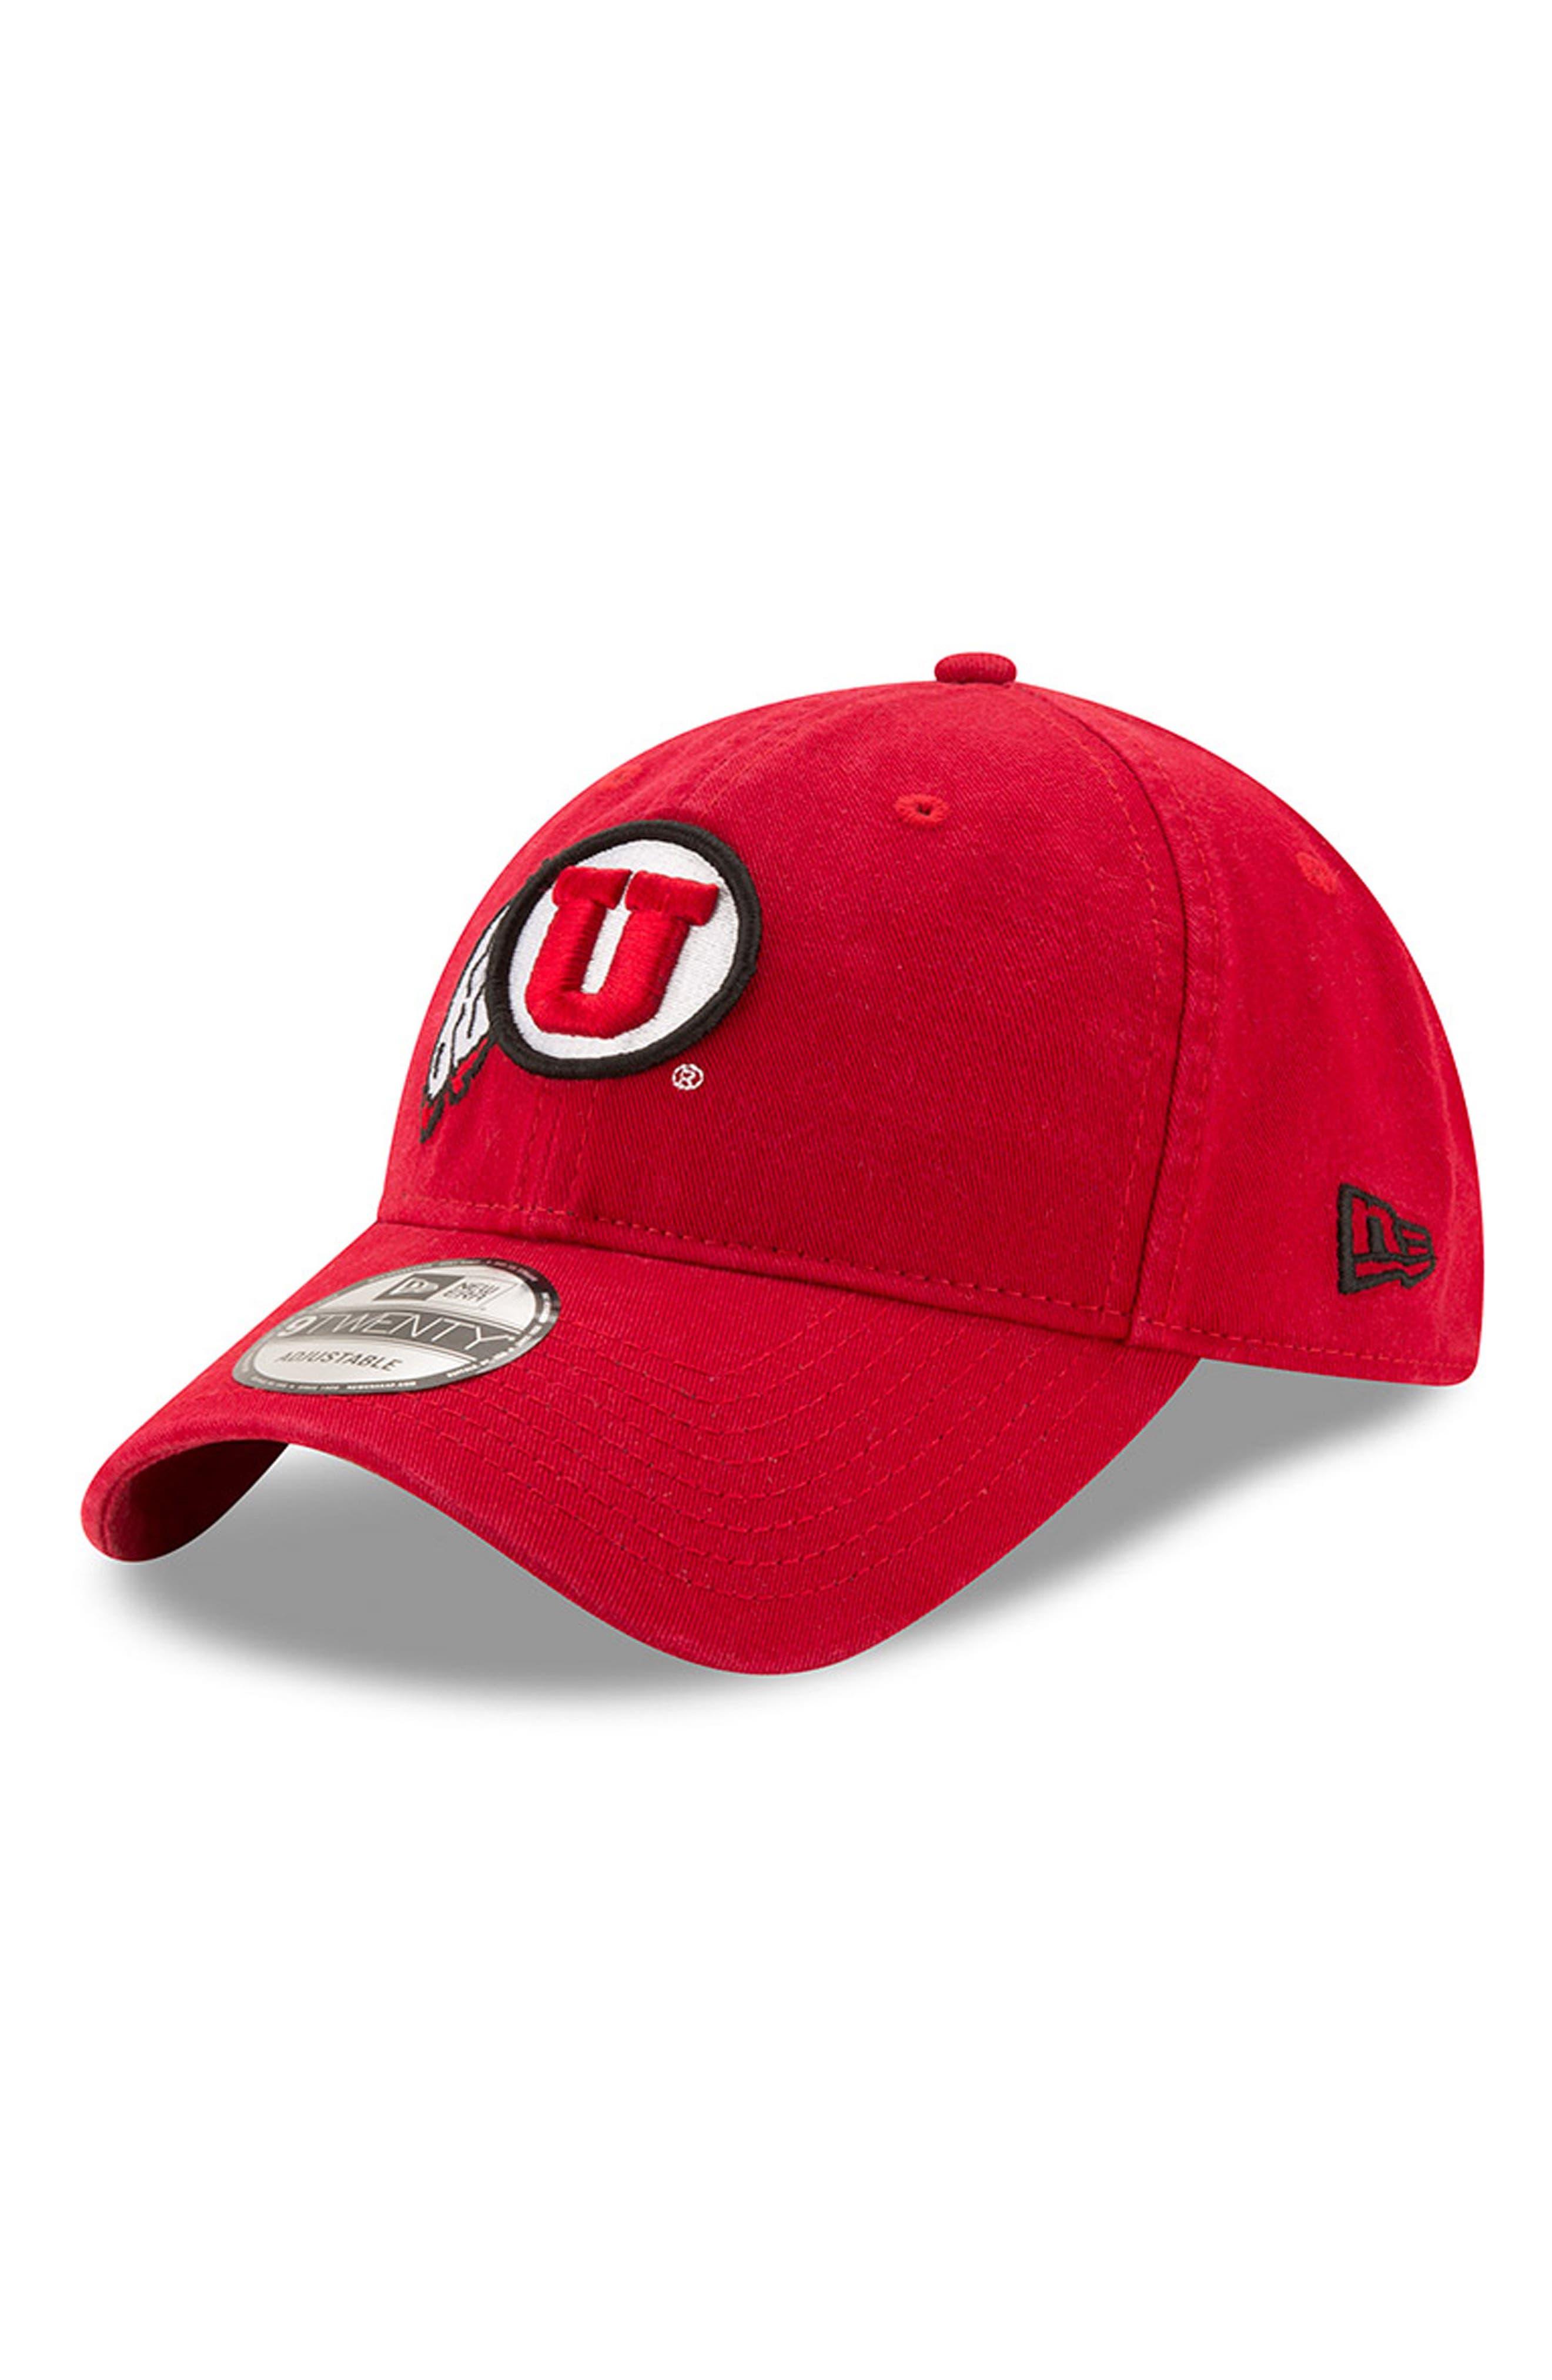 New Era Collegiate Core Classic - Utah Utes Baseball Cap,                         Main,                         color, 600